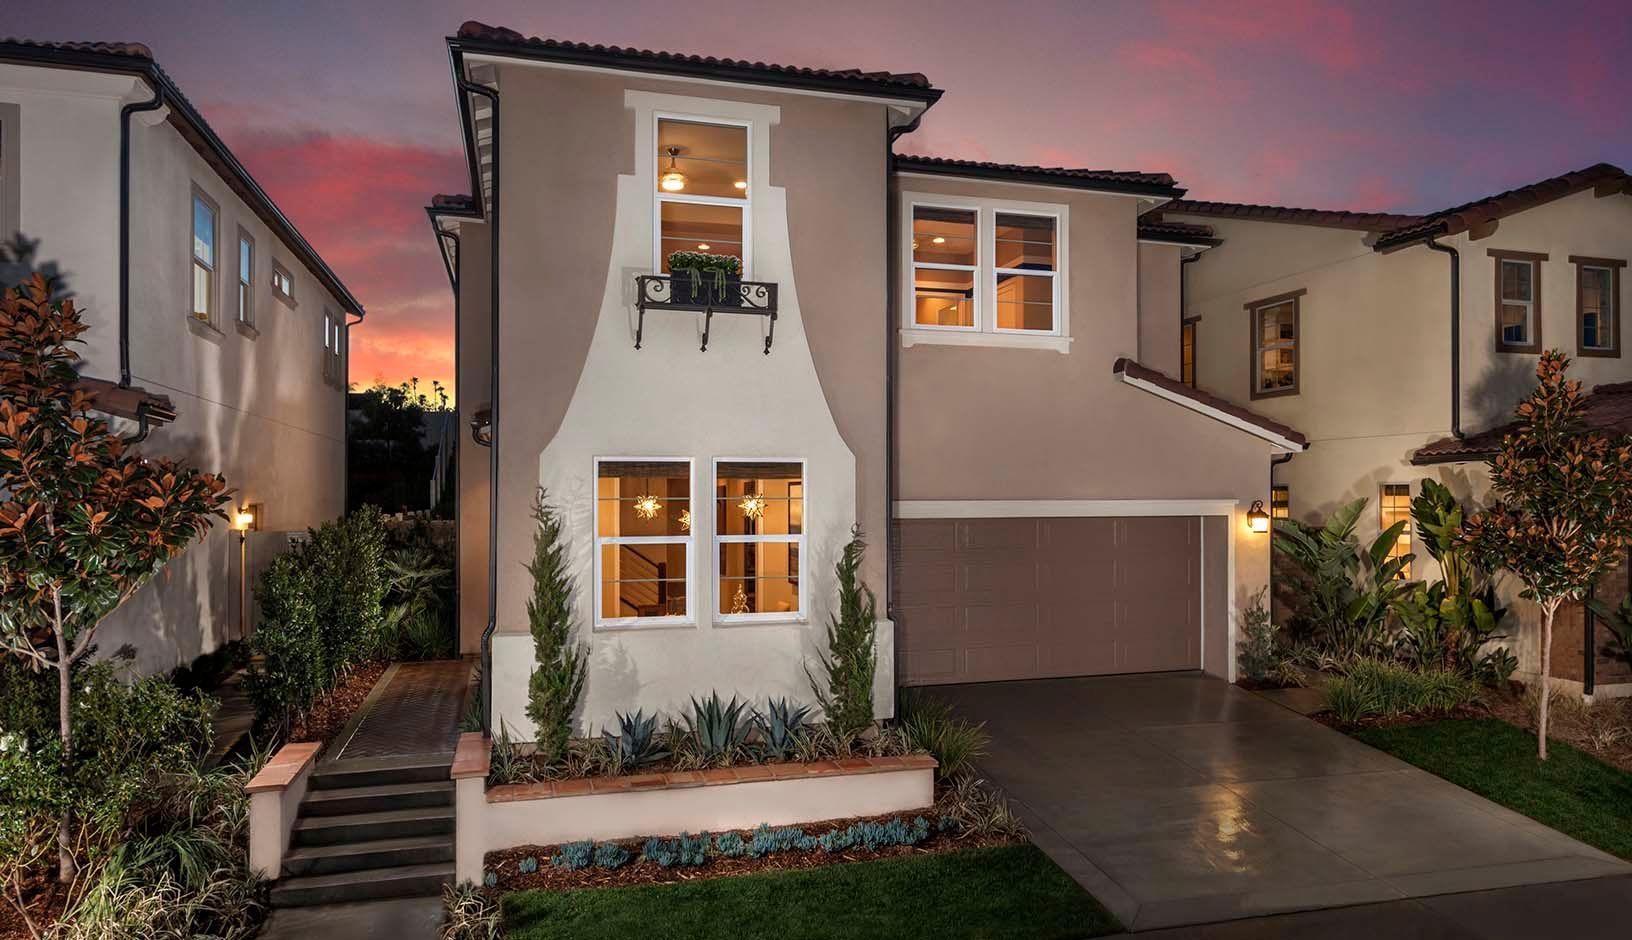 Single Family for Sale at Terrassa Villas - Residence 2 2830 Villa Catalonia Court Corona, California 92881 United States